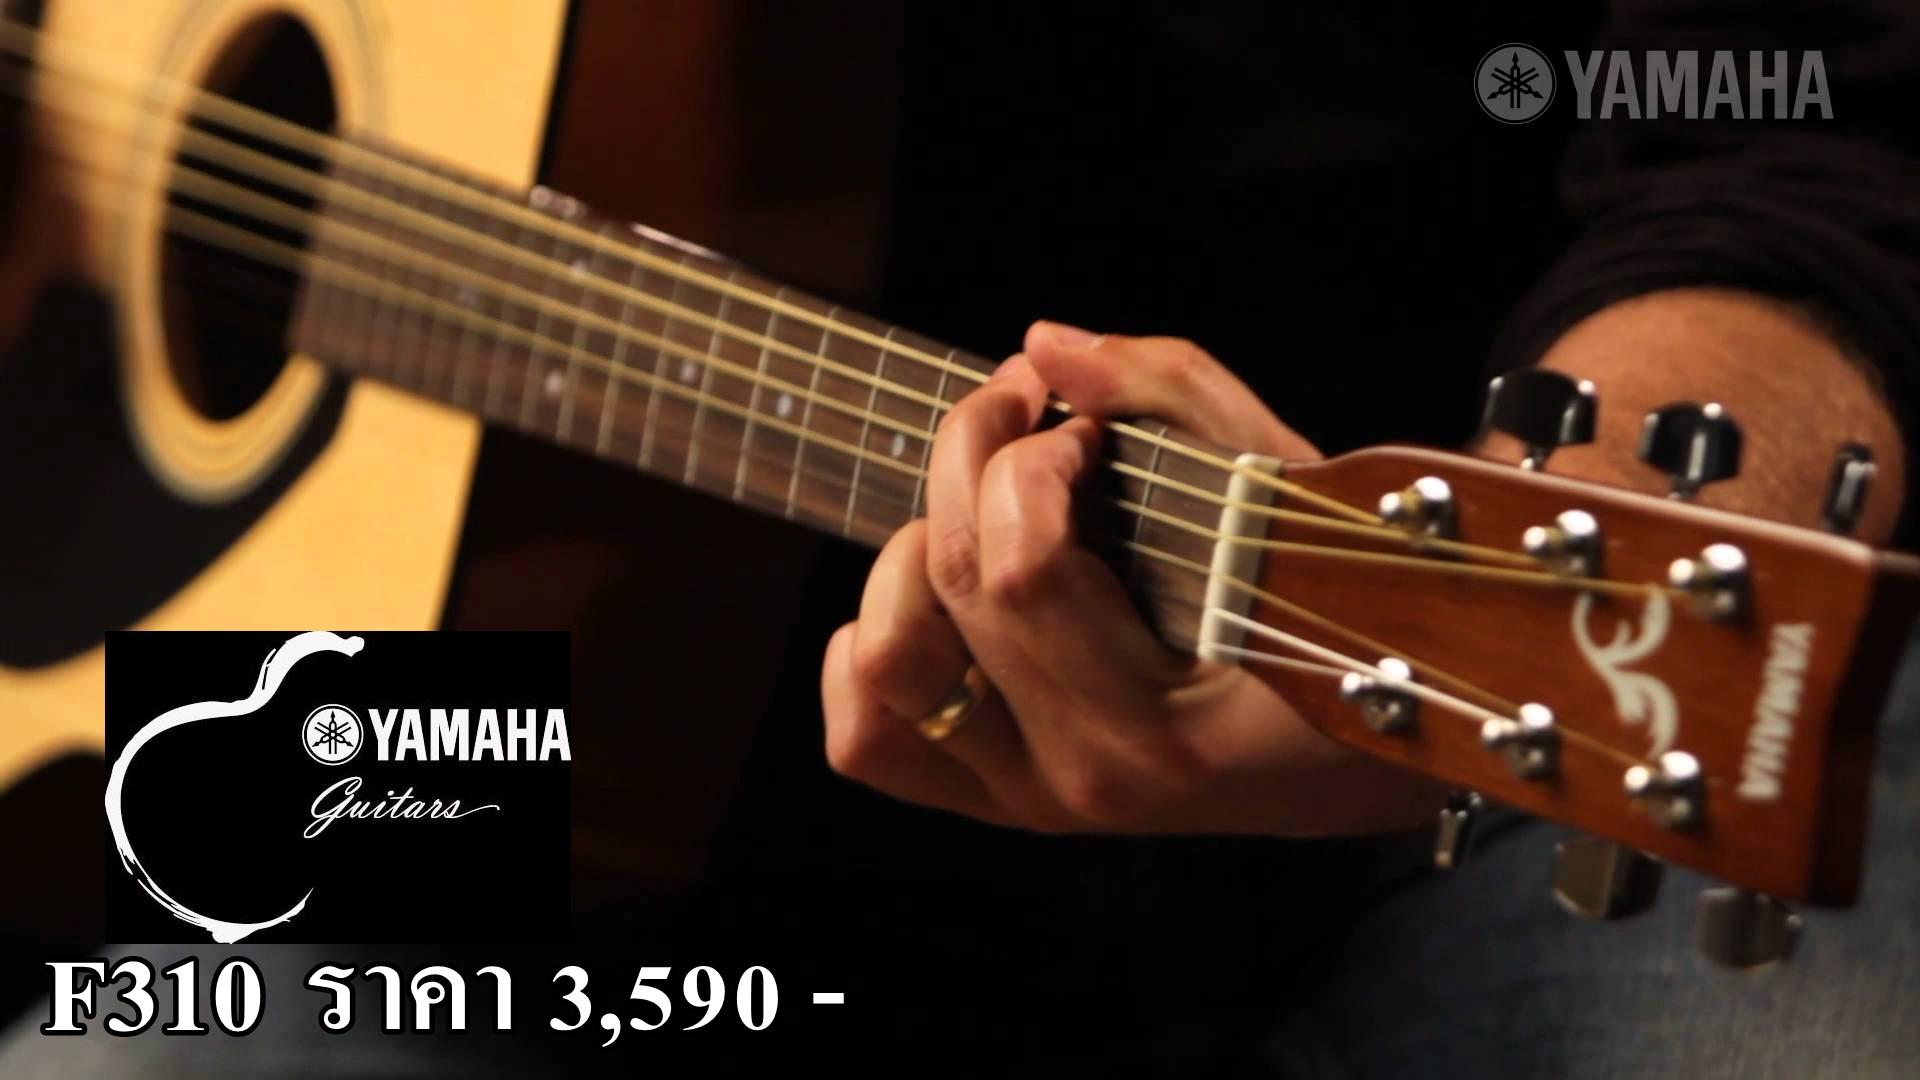 à à µà à à à à à µà à à à à à à à à music t thailand à à à à à à à à à à à à à à à µà à à à à à à à